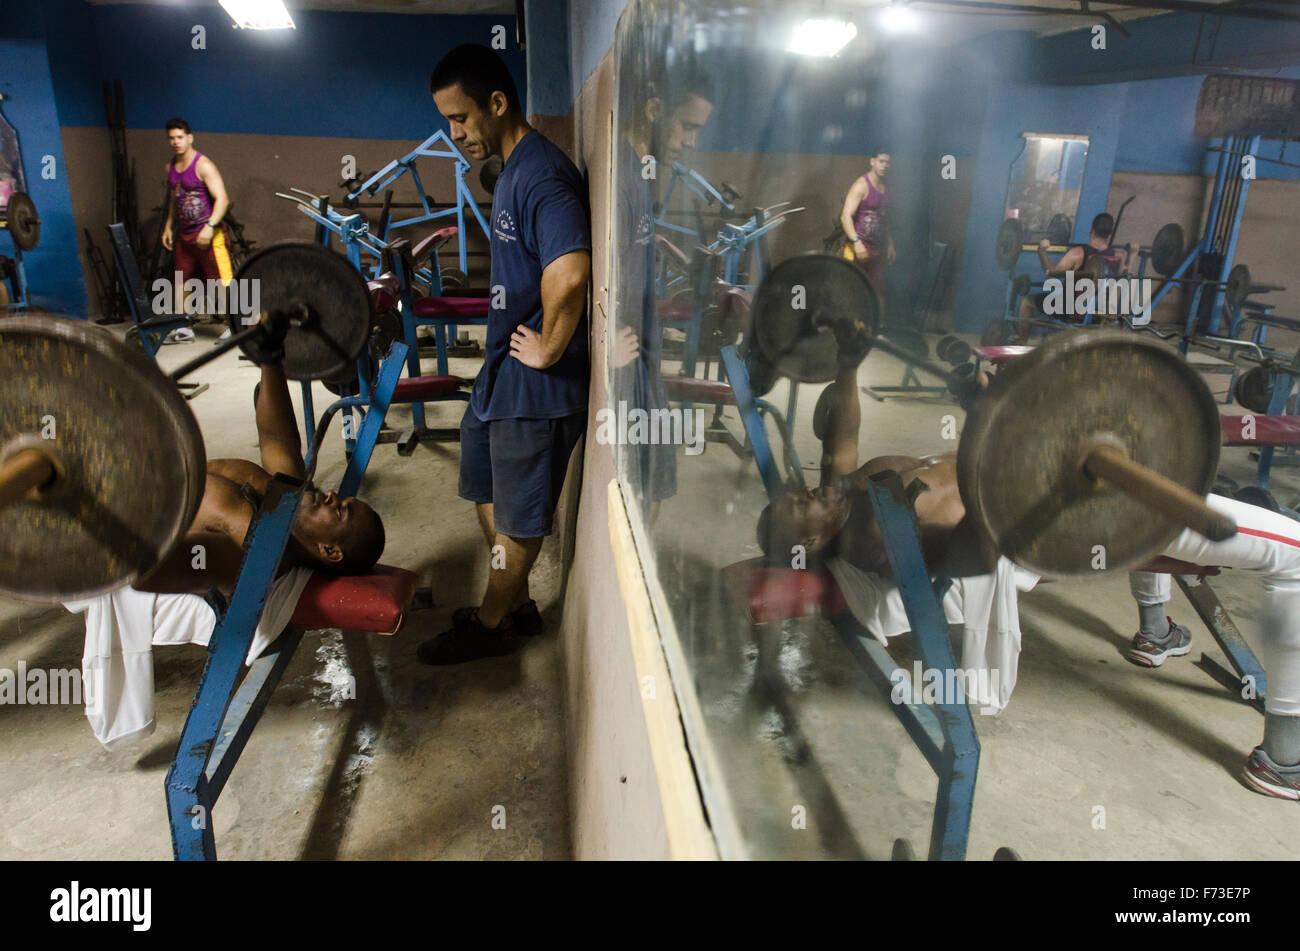 Men work out in a gym in Havana, Cuba. - Stock Image